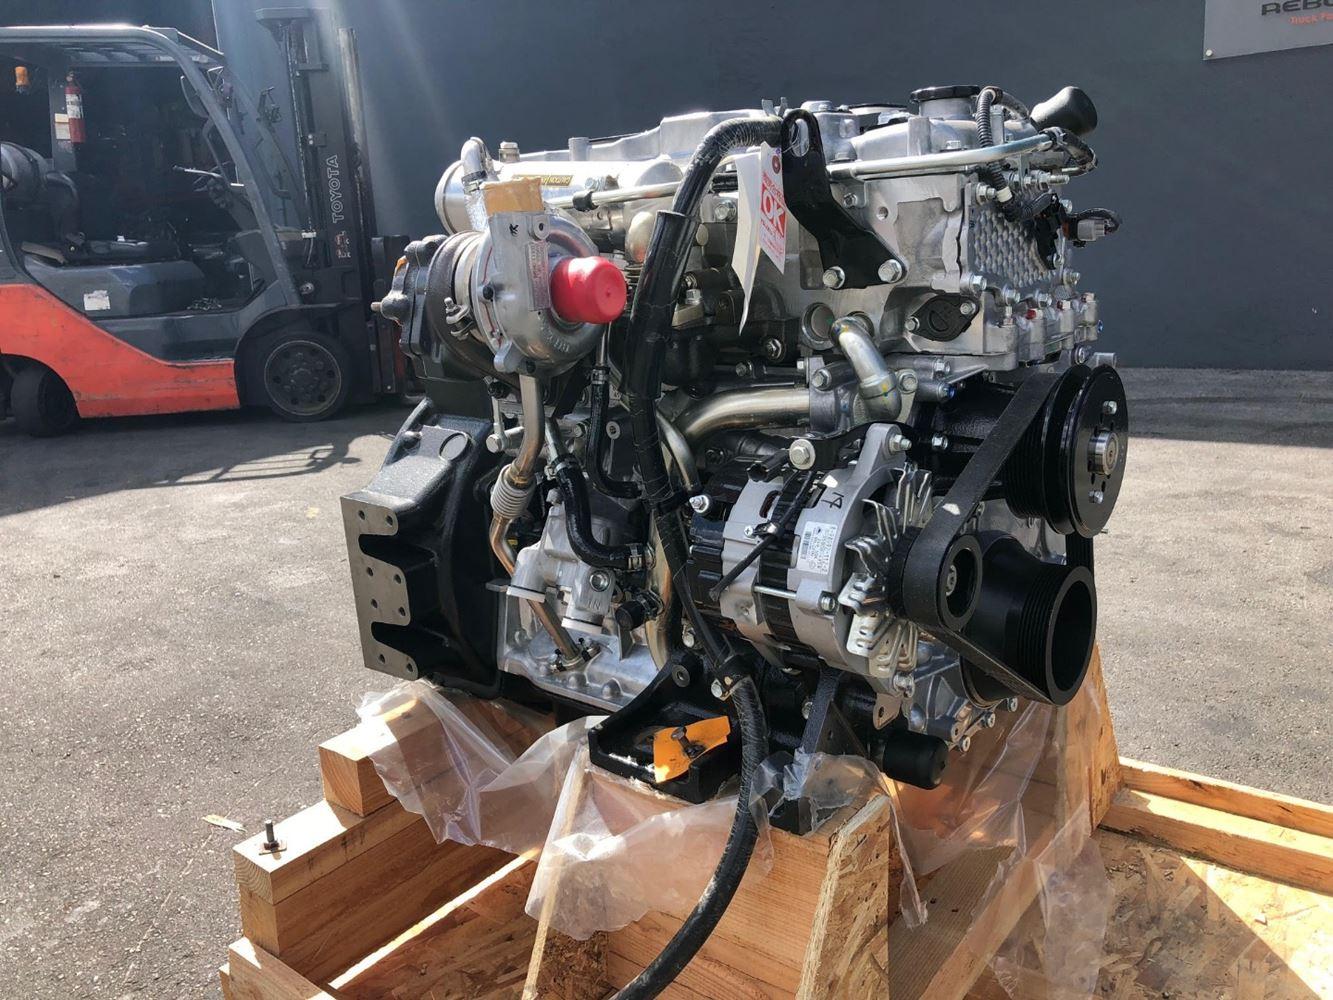 Isuzu 4JJ1 (Stock #003901) | Engine Assys | TPI